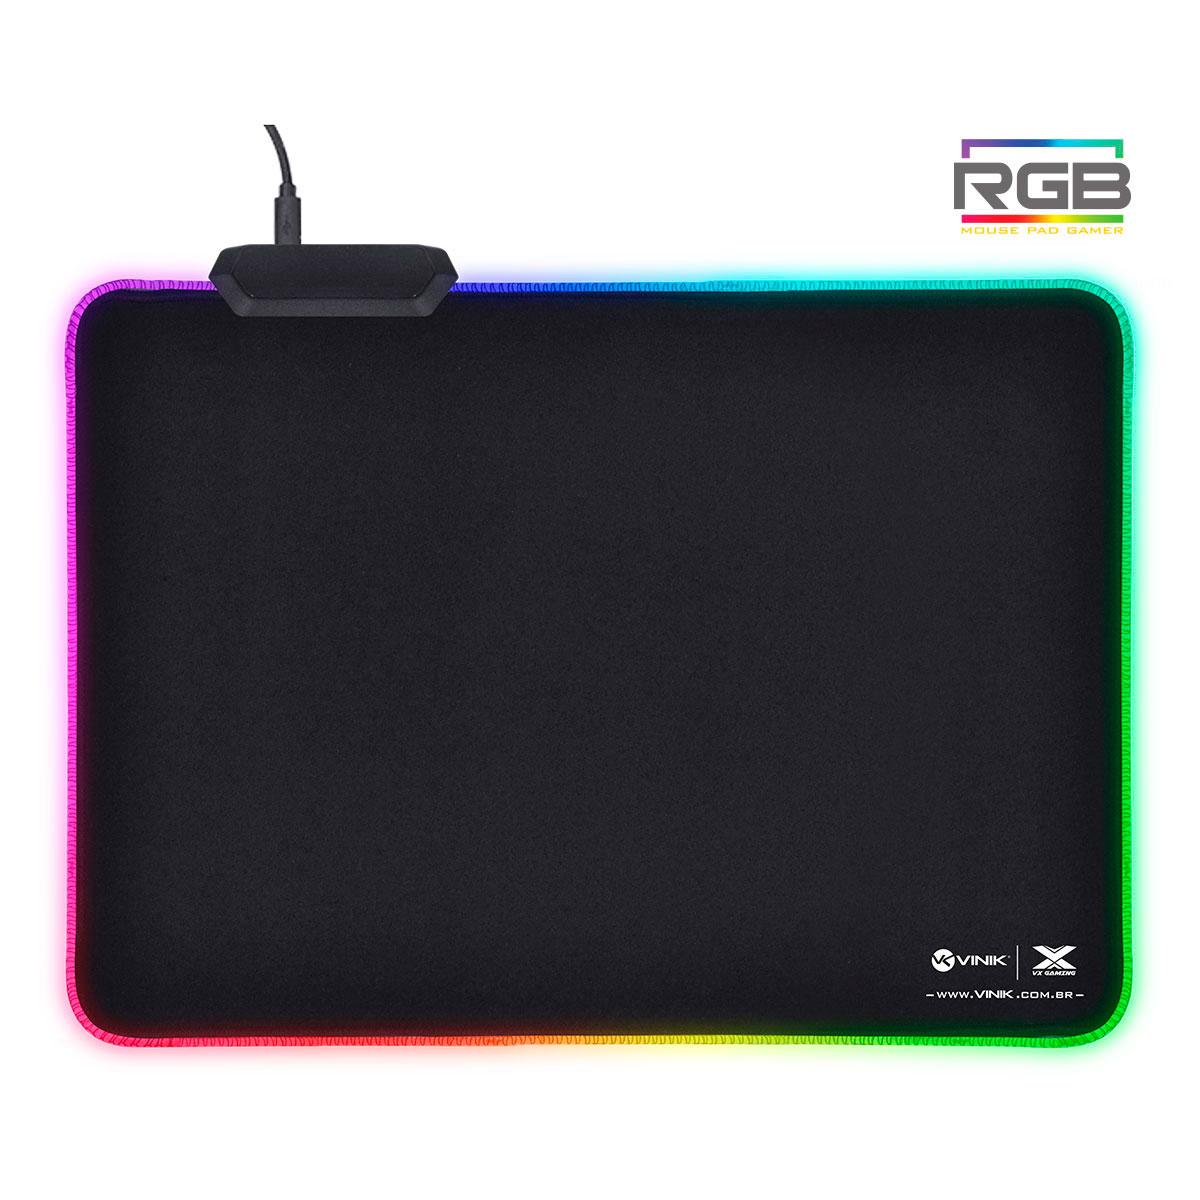 Mouse Pad Gamer Vinik VX Gaming RGB, Antiderrapante, 1 Porta USB, 250x350x3mm - 34684